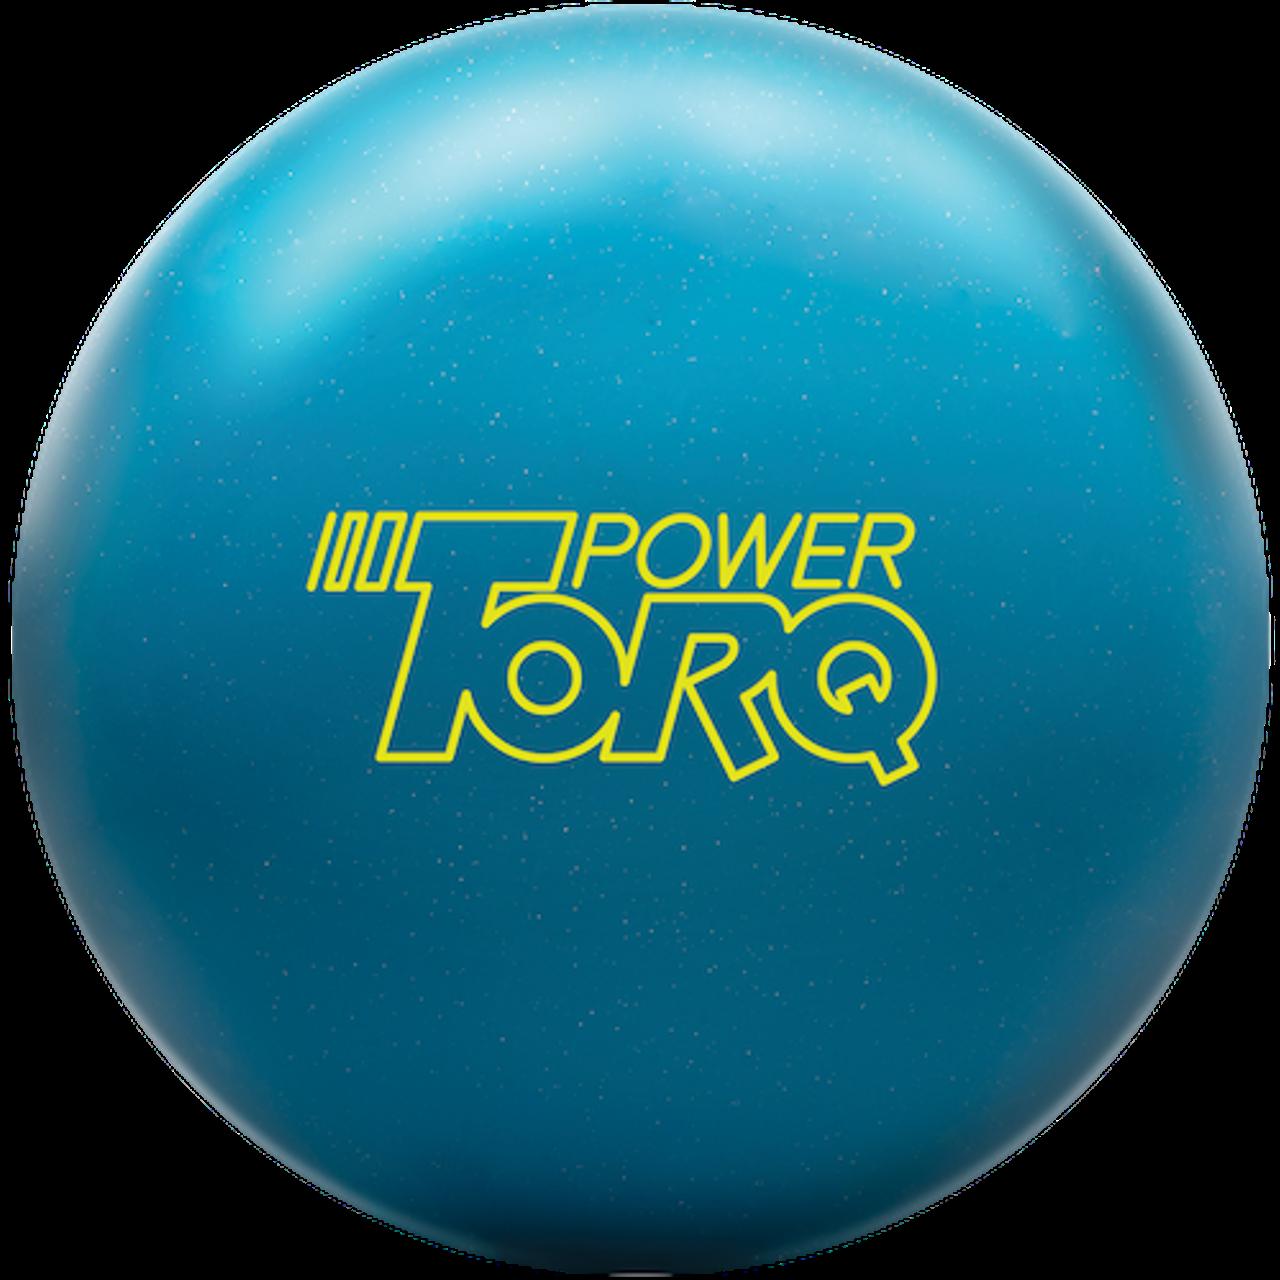 Columbia 300 Power Torq Bowling Ball